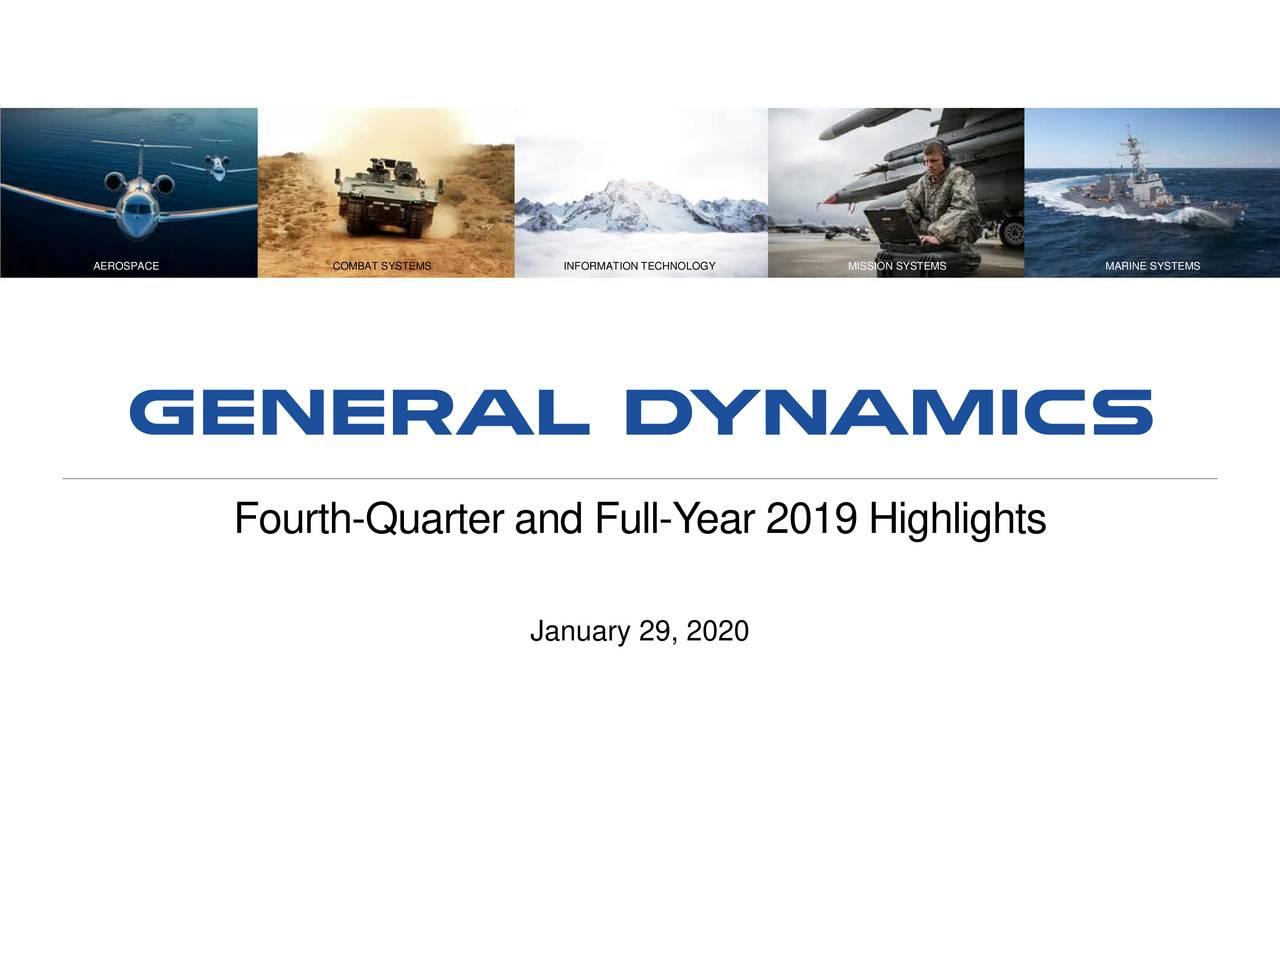 General Dynamics Corporation 2019 Q4 - Results - Earnings Call Presentation - General Dynamics Corporation (NYSE:GD) | Seeking Alpha